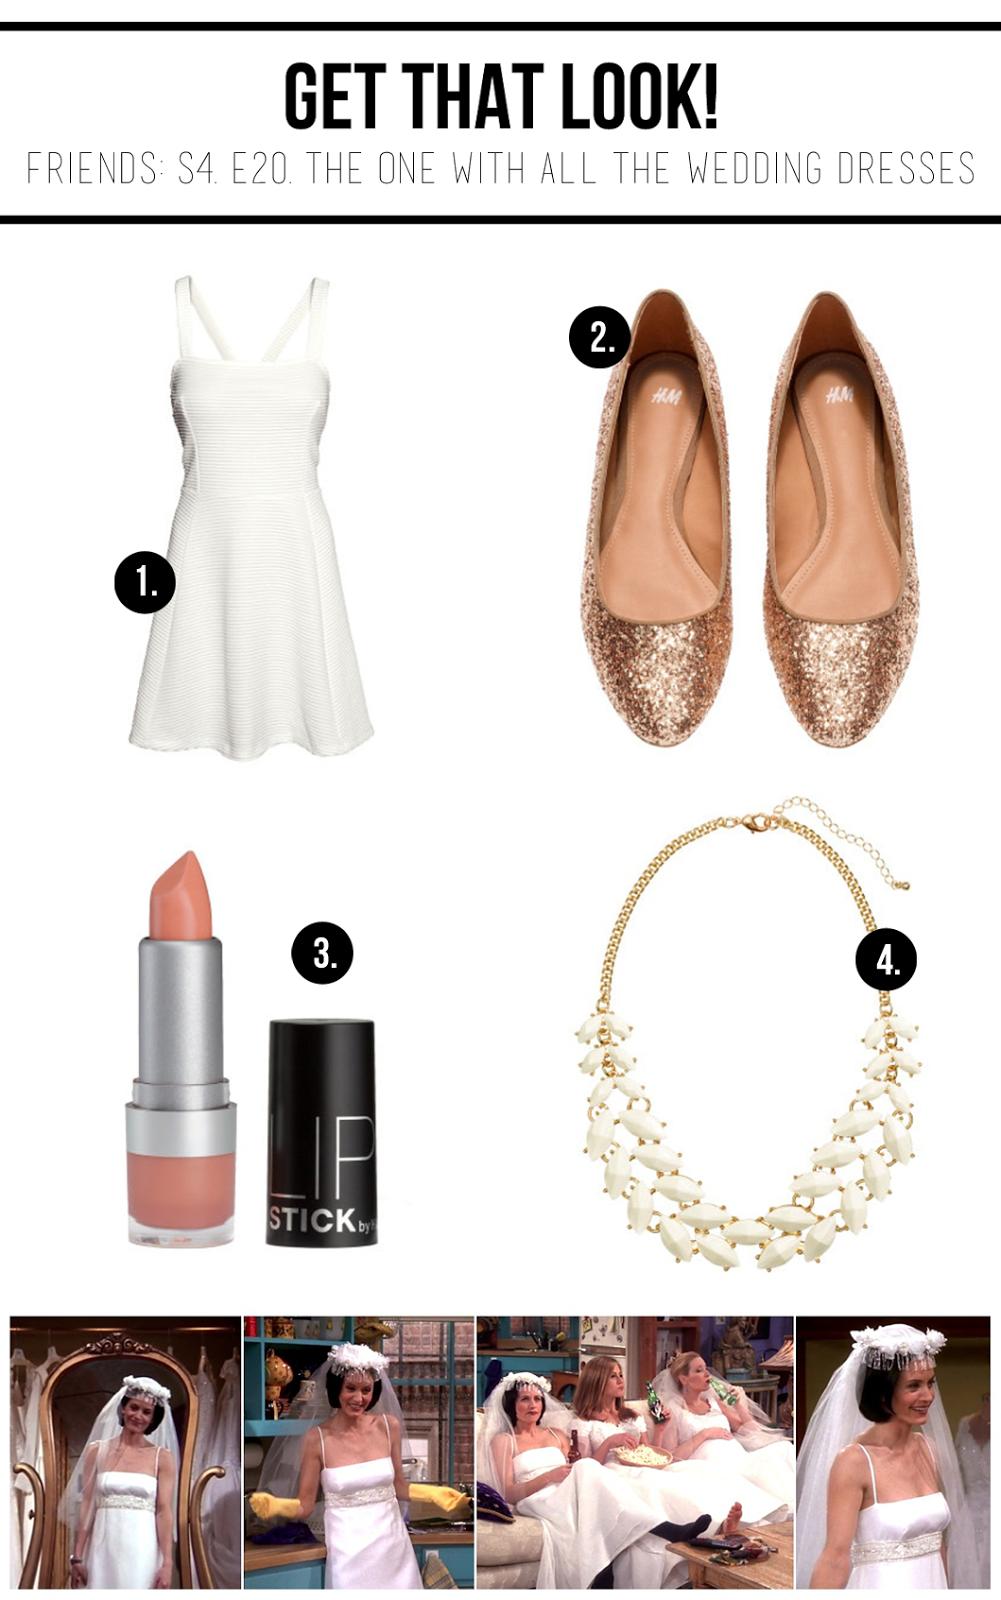 friends-wedding-dresses-inspiration-monica-fashion.png